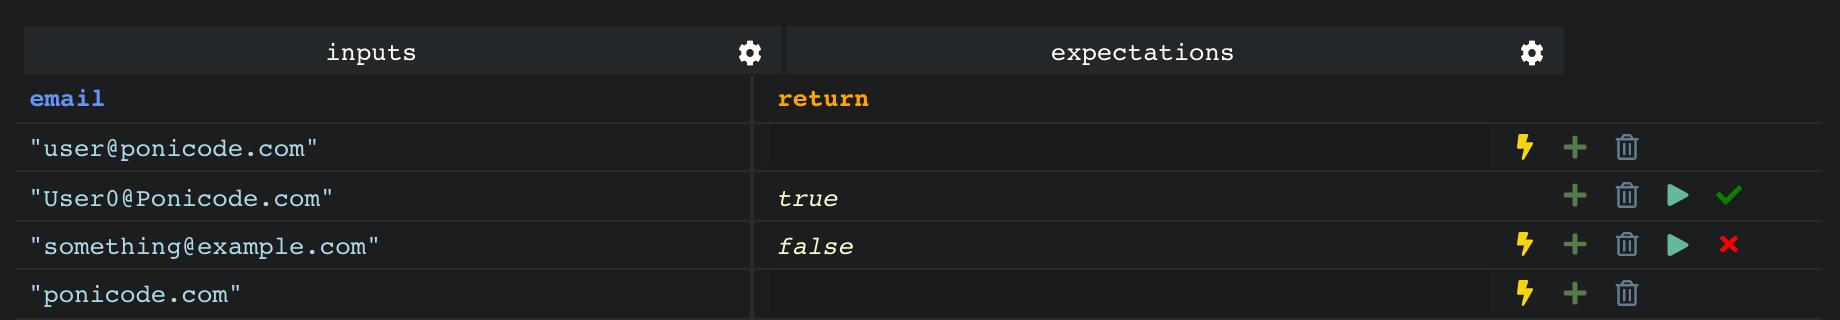 ponicode-interface-columns